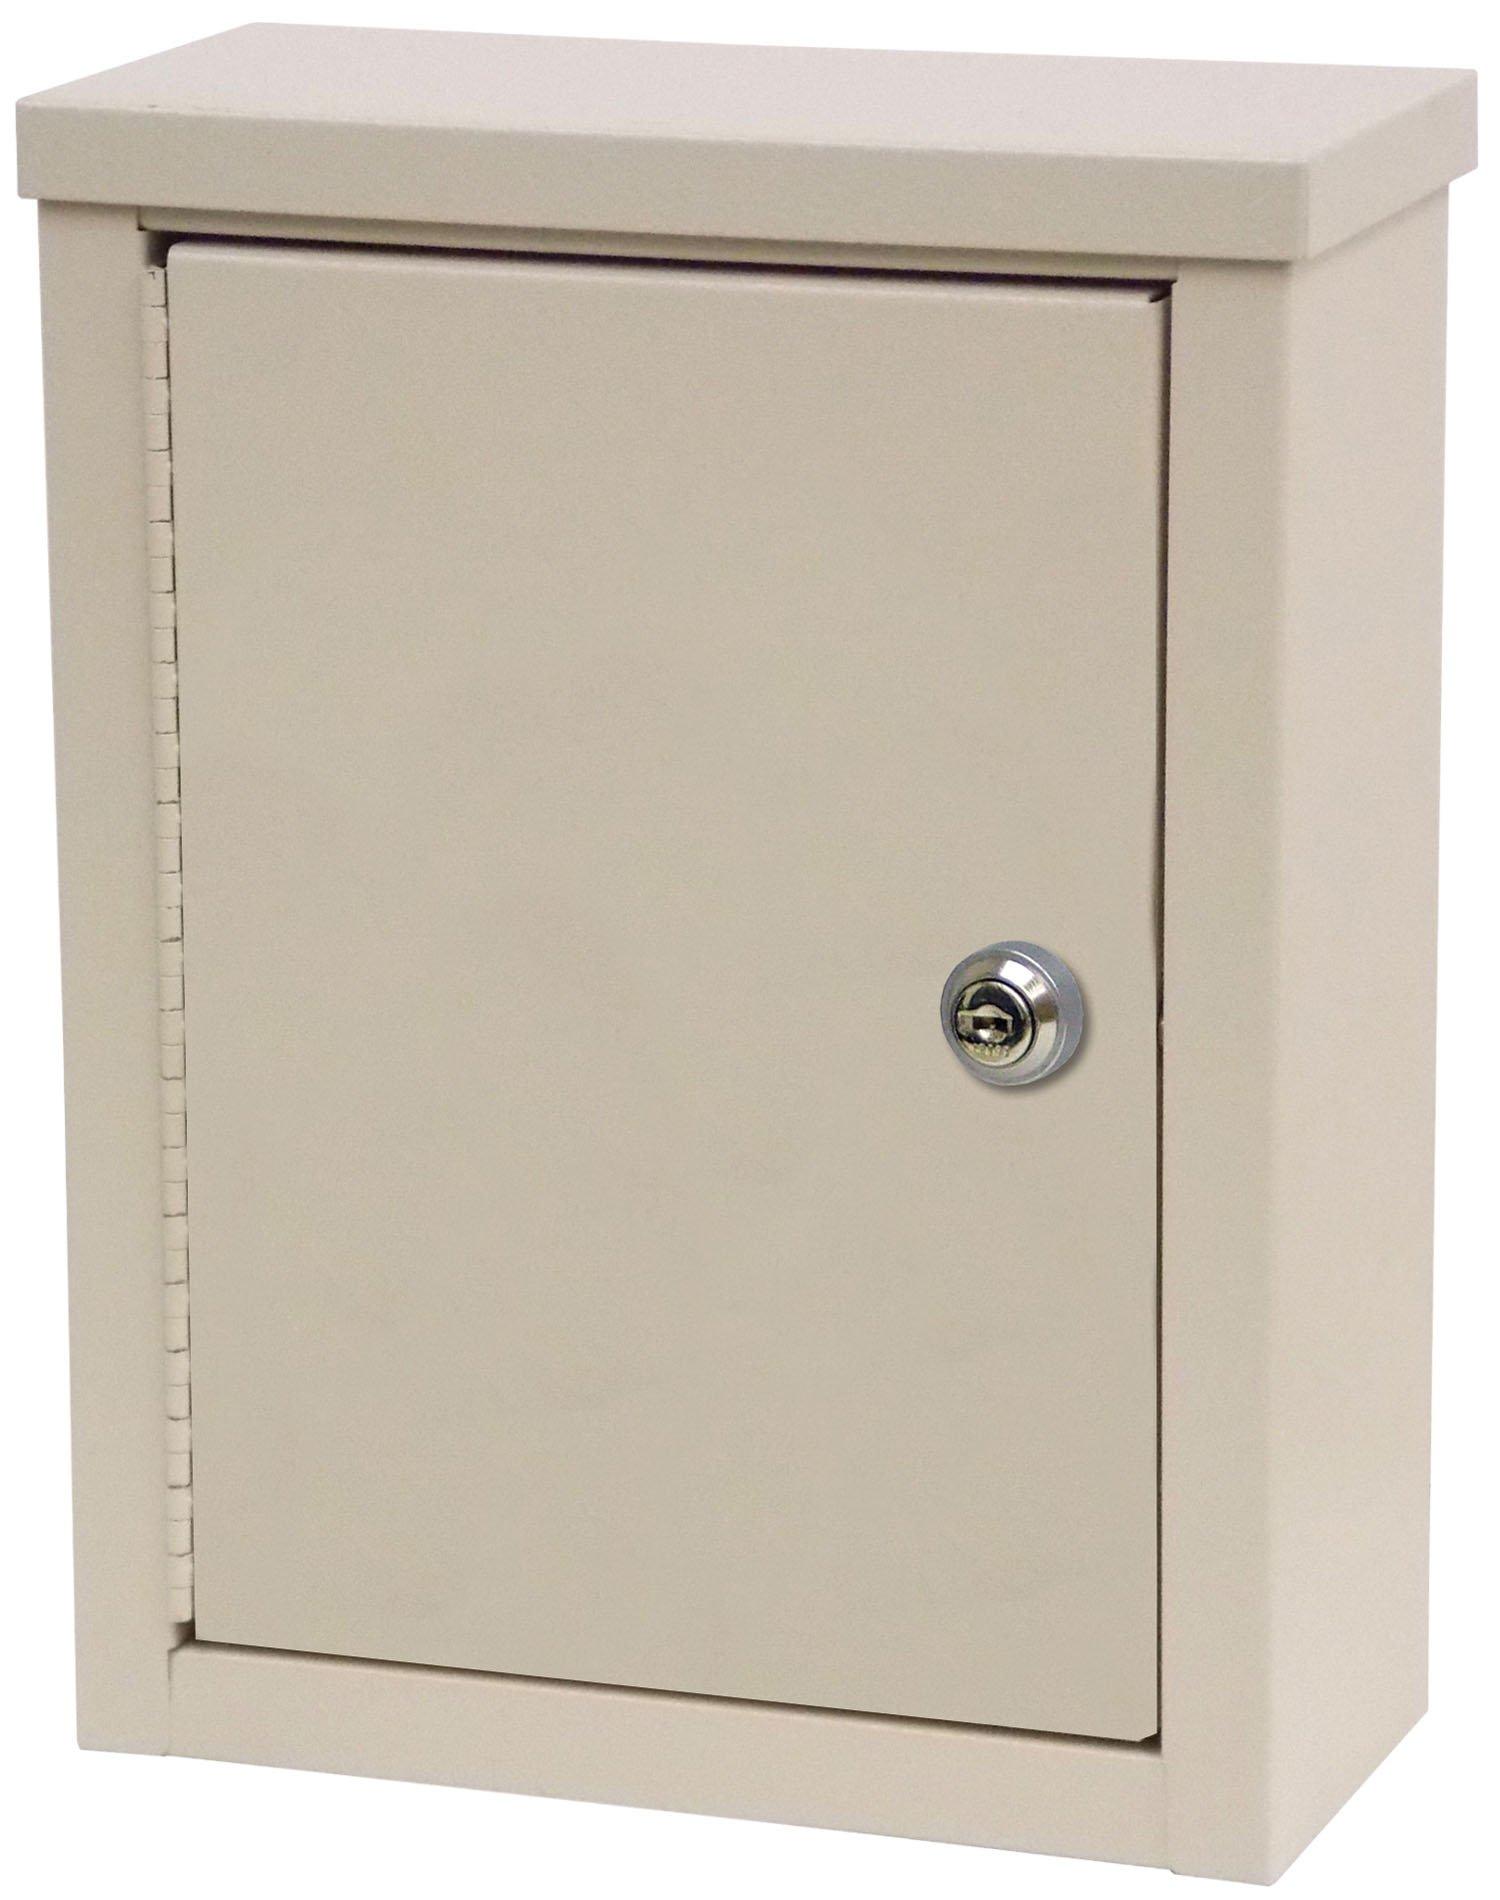 Mini Wall Storage Cabinet with Flat Key Lock - Beige